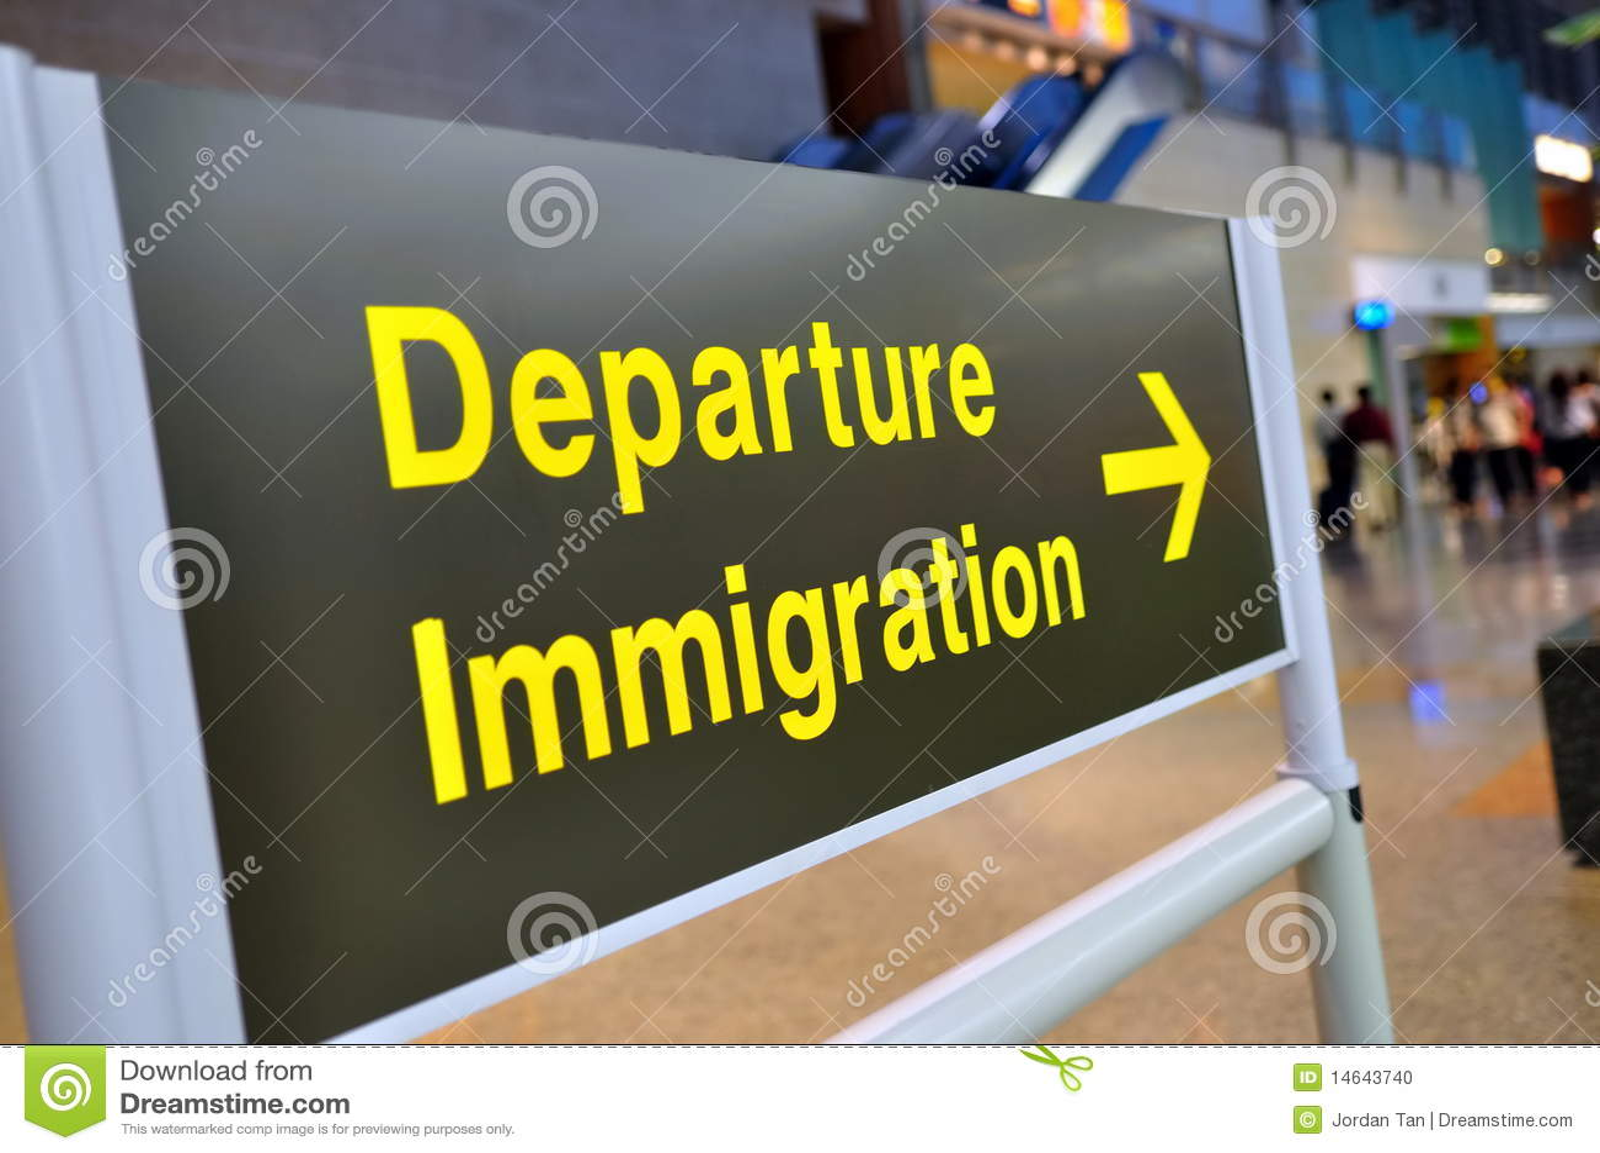 Departure immigration